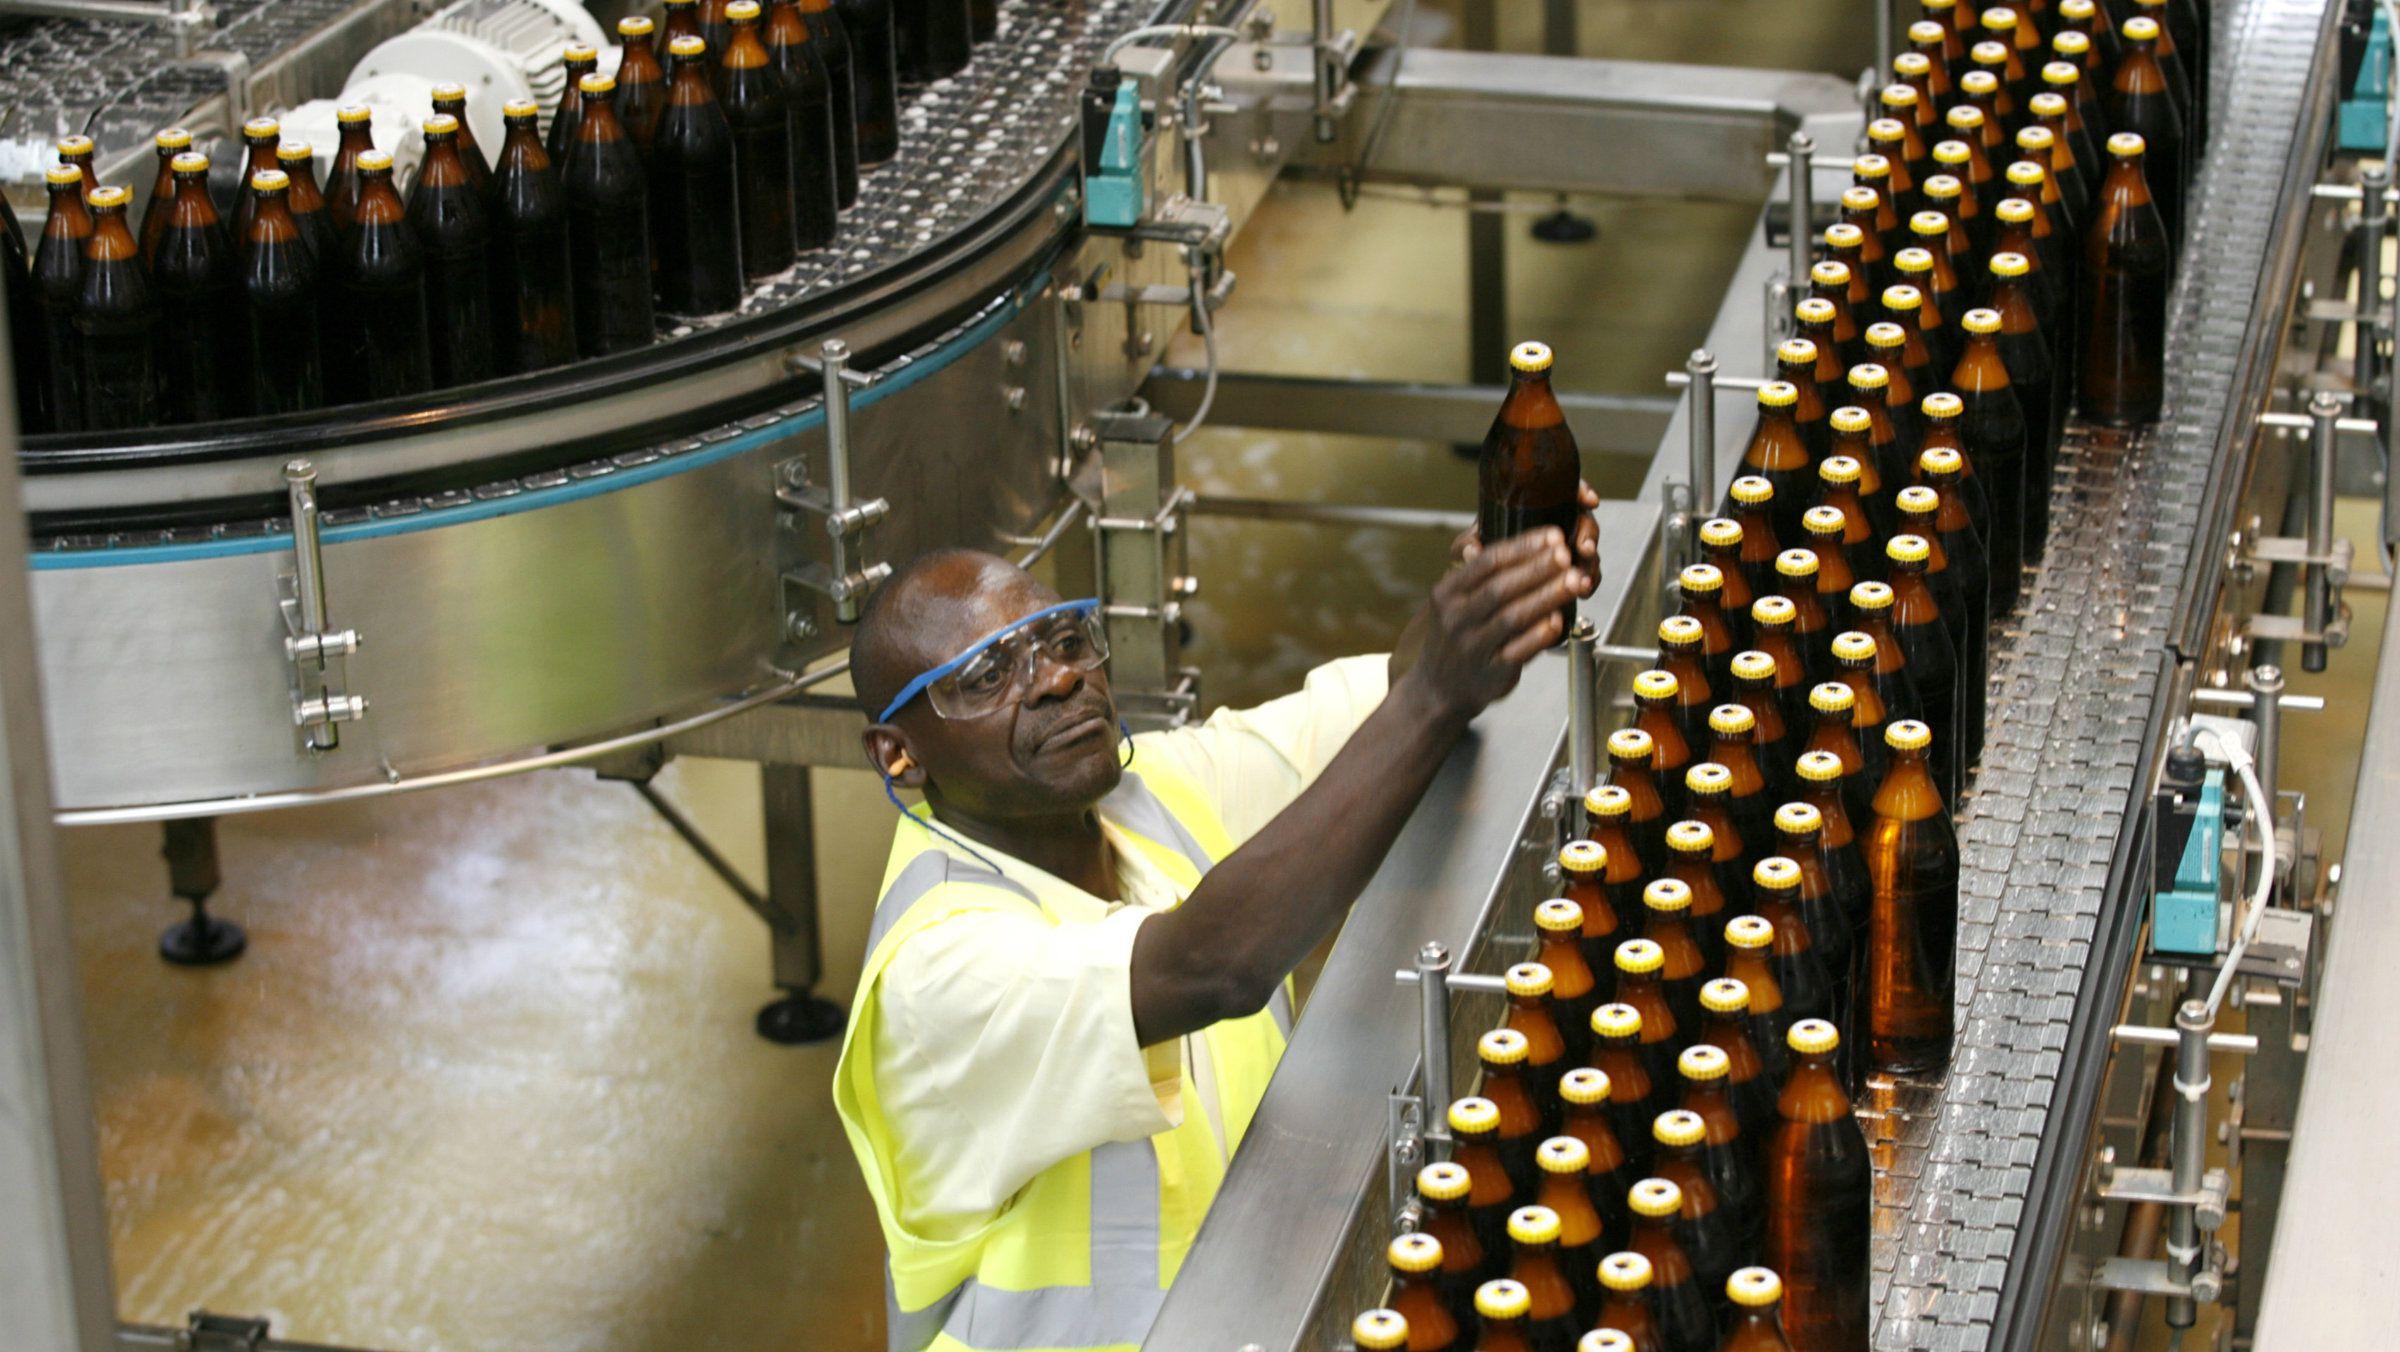 A worker inspects beer bottles on a conveyor belt of a factory in Nairobi, Kenya.